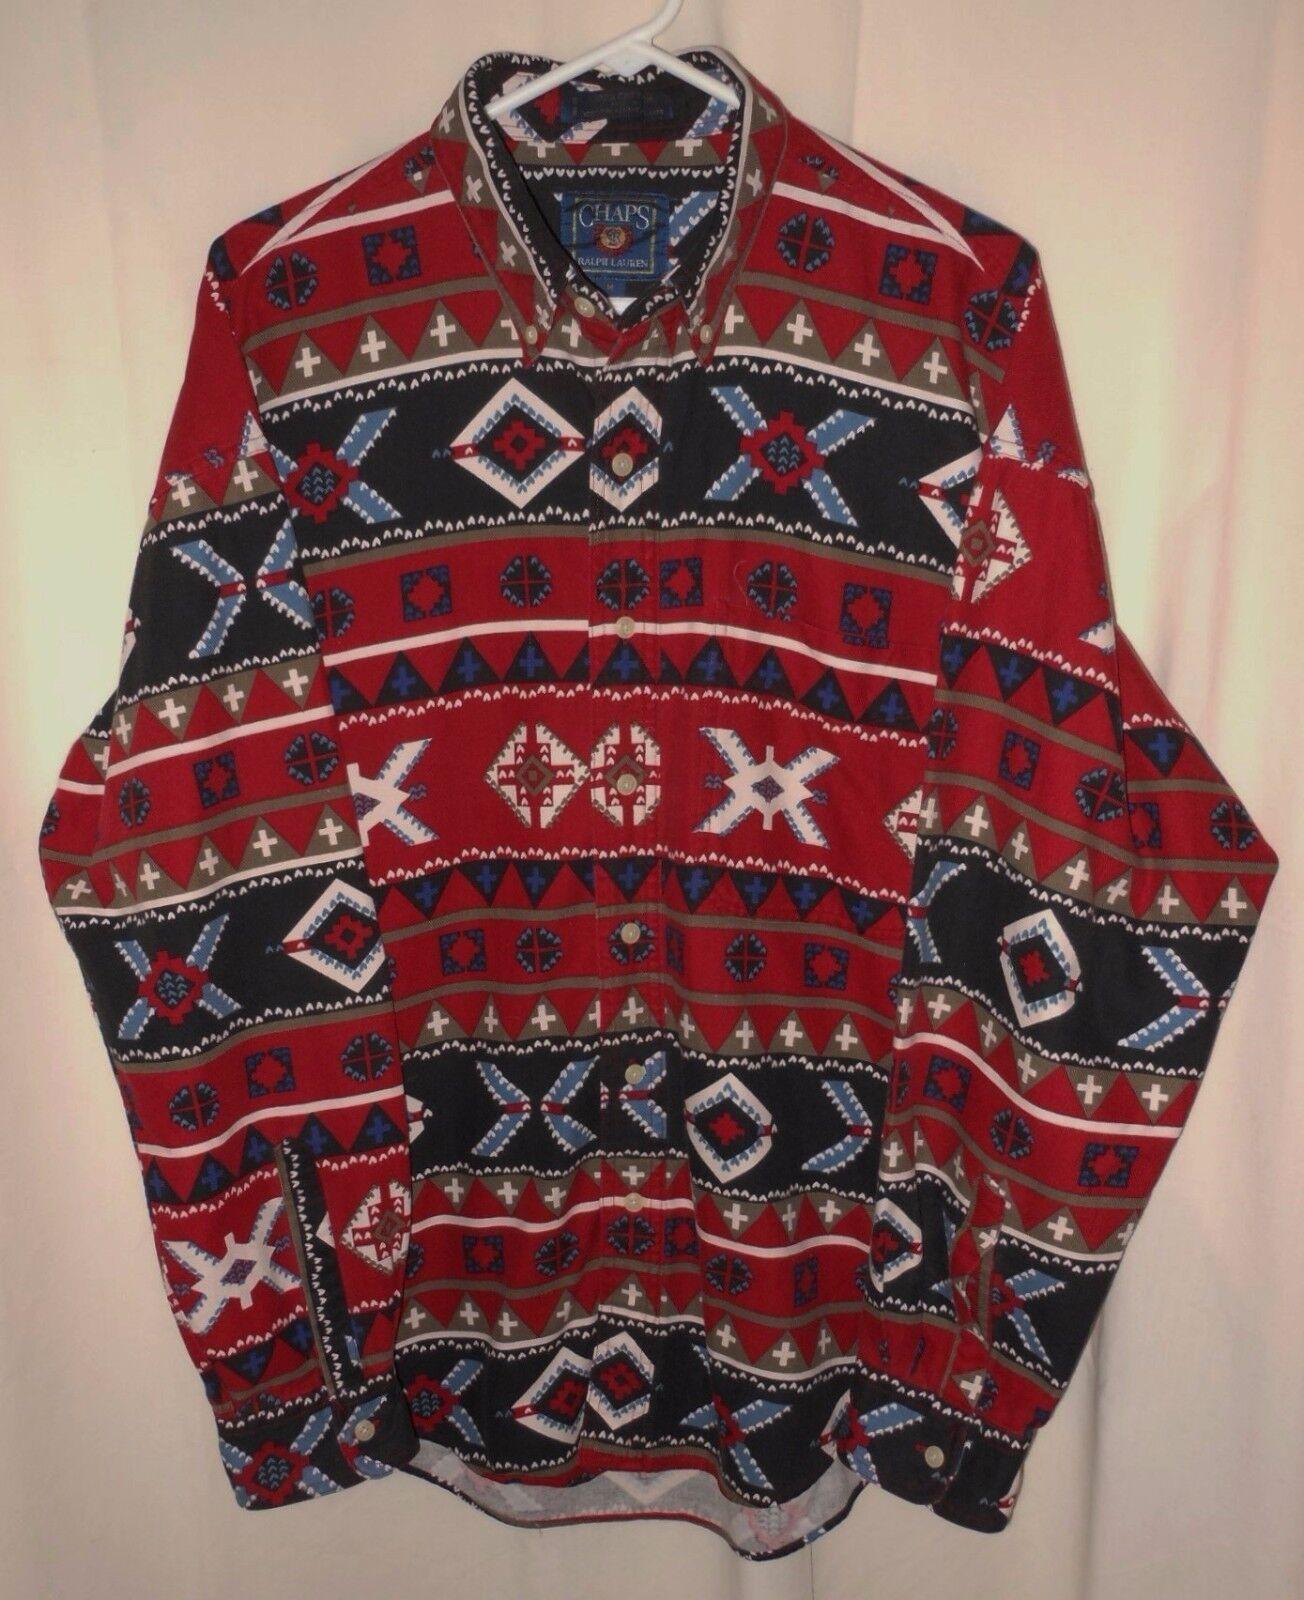 Vtg Ralph Lauren Chaps Shirt Fancy Printed Nordic Design 100% Cotton Medium